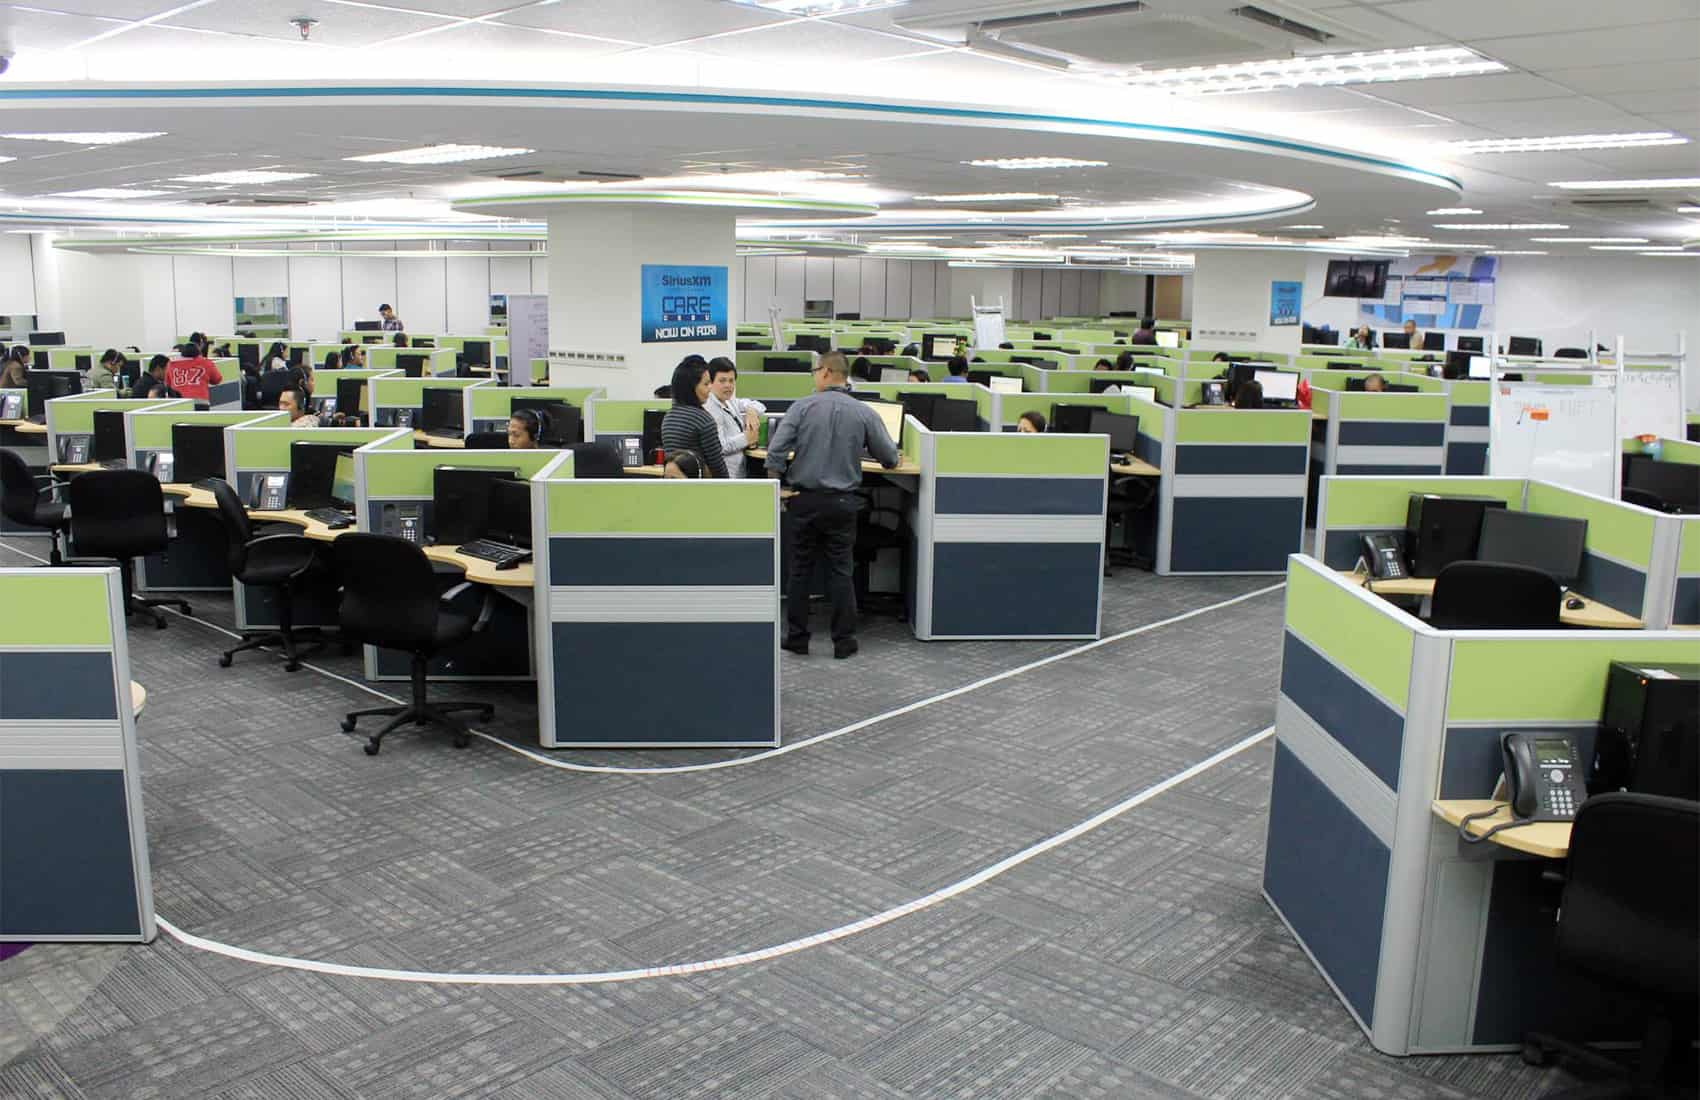 House Design Companies Australia U S Company Hiring Bilingual Staff At New Heredia Call